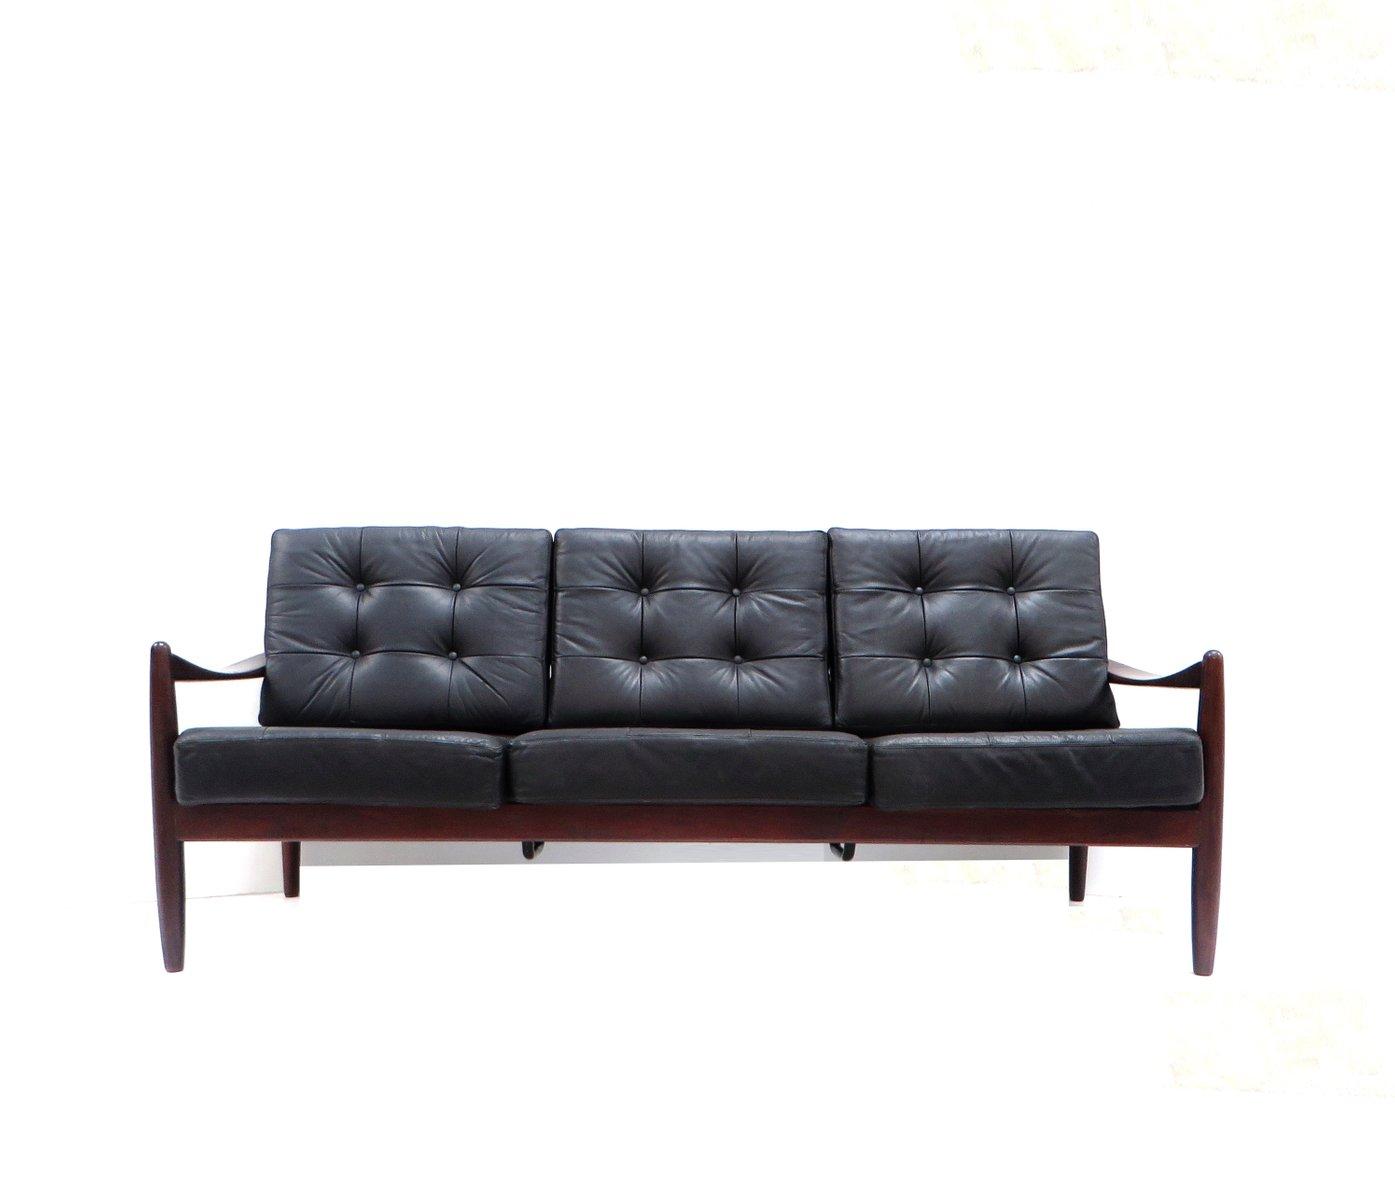 d nisches vintage 3 sitzer ledersofa bei pamono kaufen. Black Bedroom Furniture Sets. Home Design Ideas